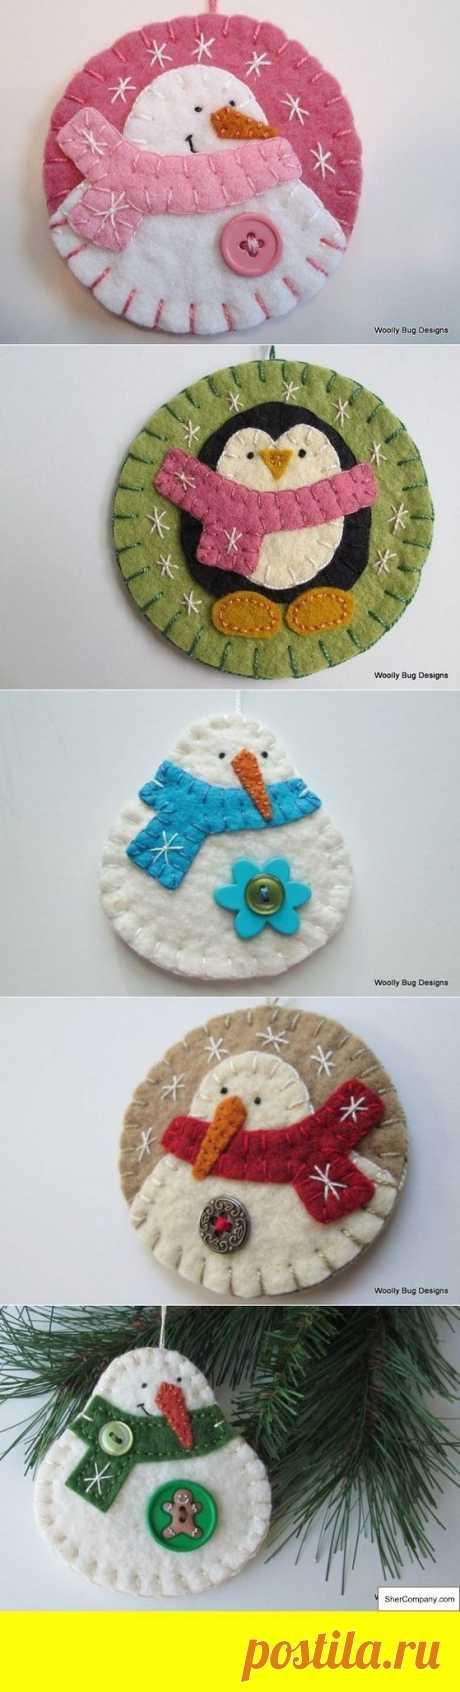 Easy DIY Felt Crafts, Felt Crafts Patterns and Felt Monster Crafts. Pics 43097257 #feltcrafts #craftideas